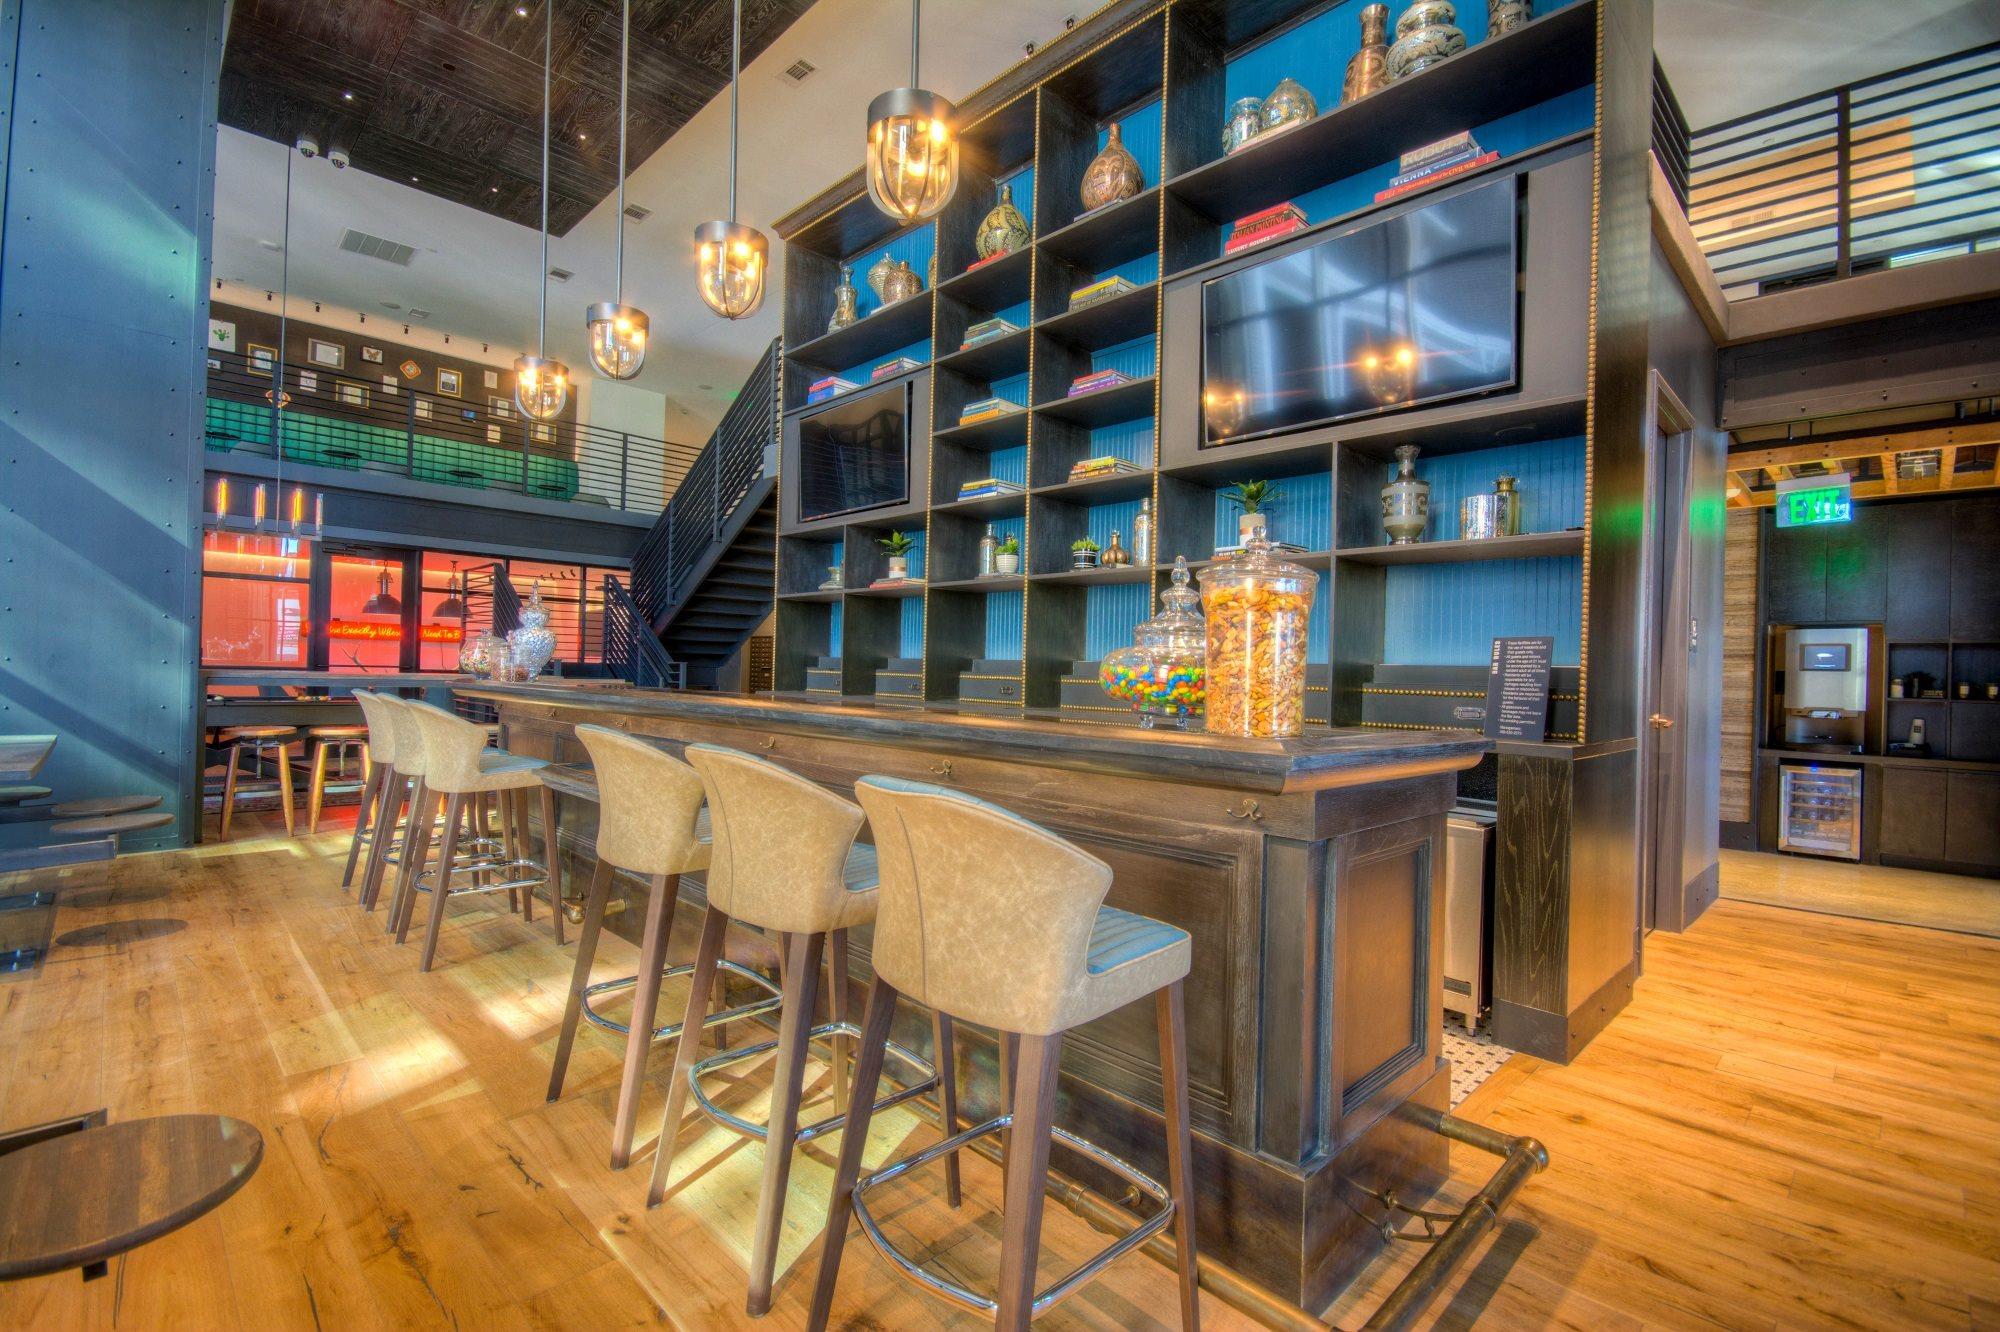 vintage-inspired residential bar area